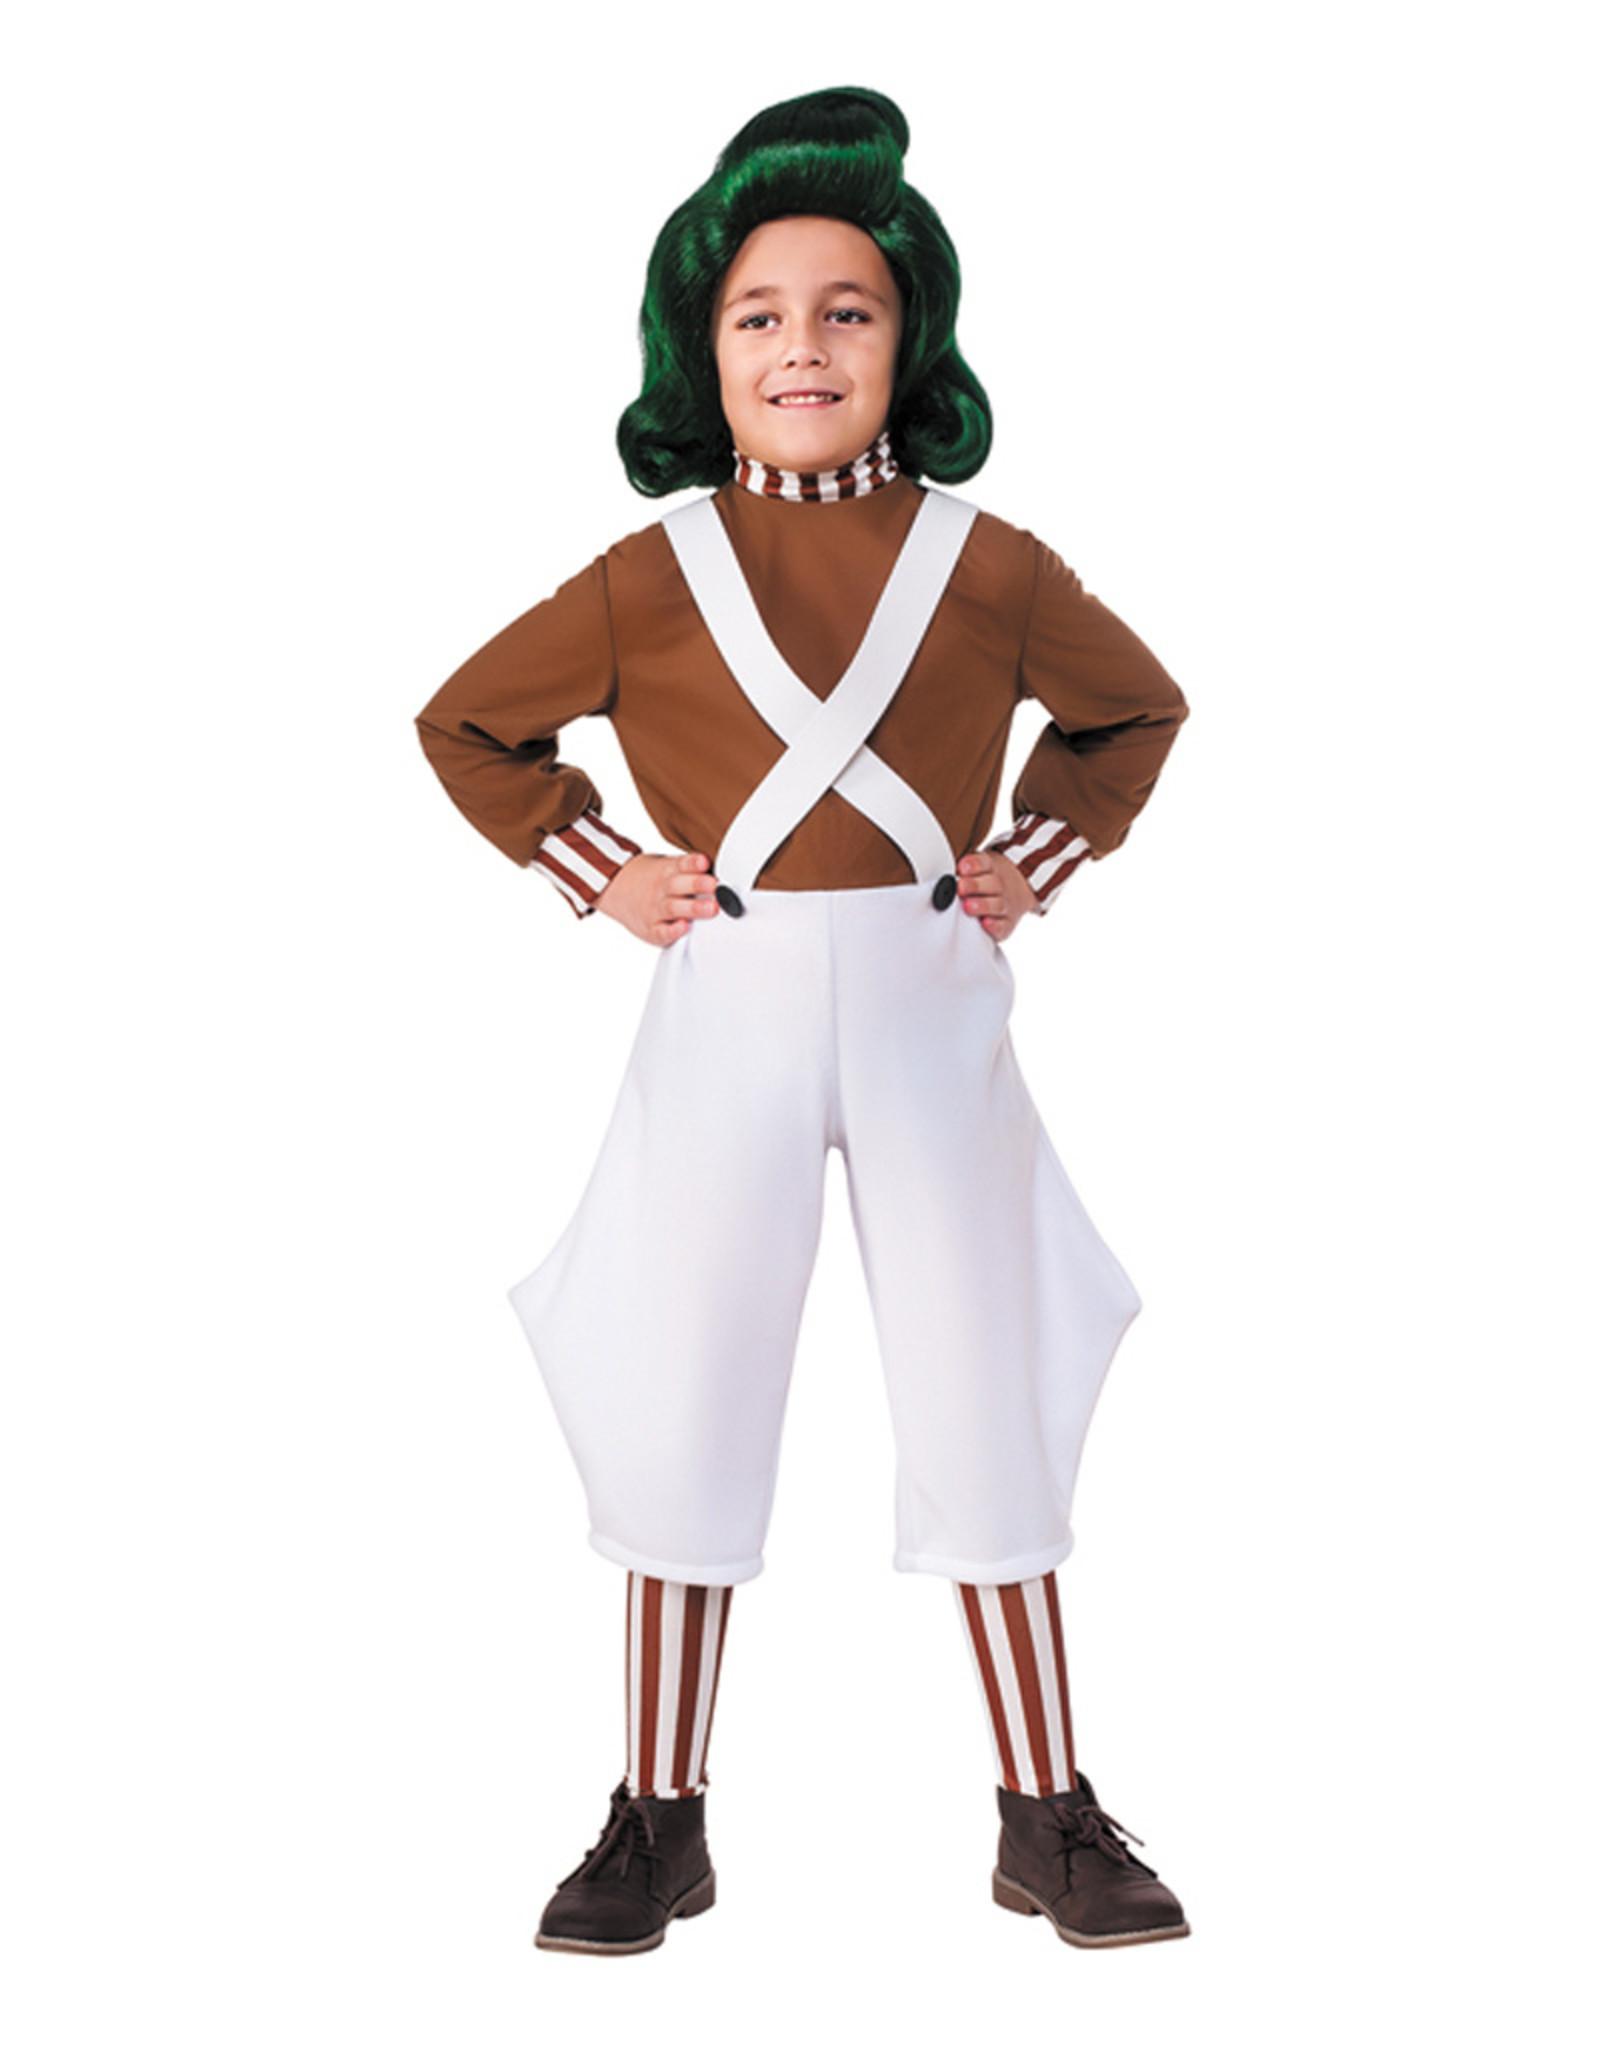 Oompa Loompa Costume - Boys